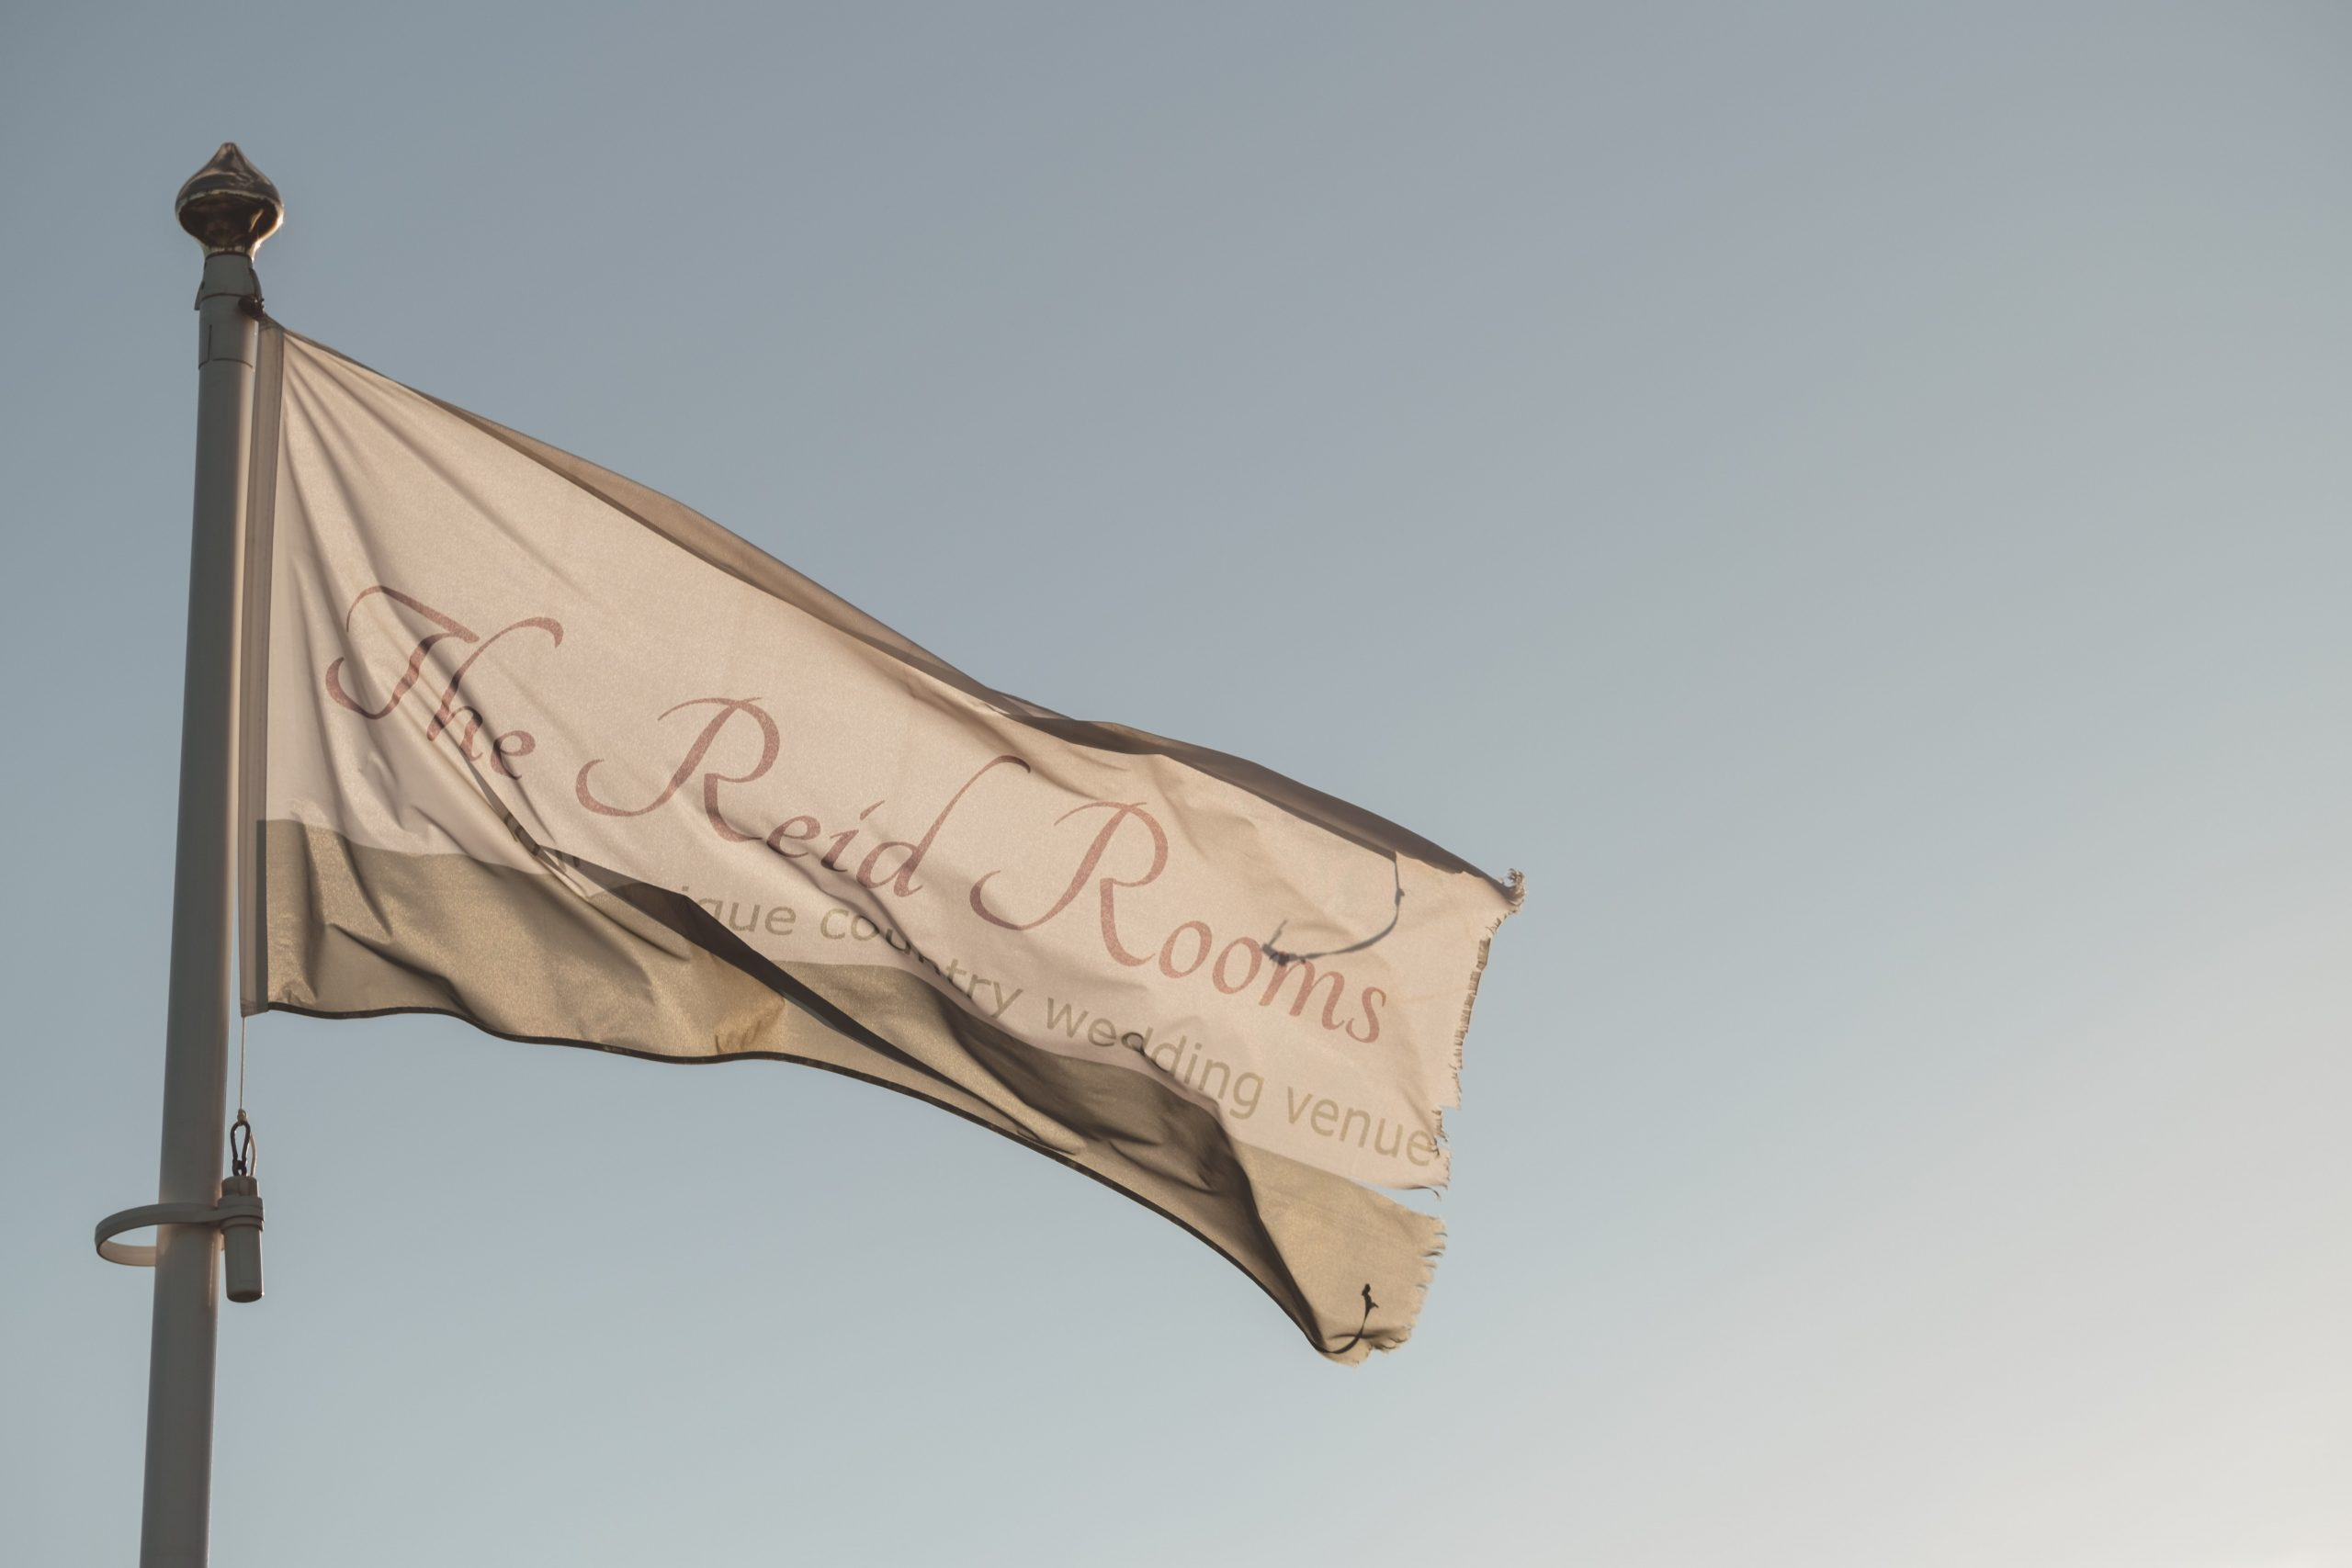 the reid rooms flag